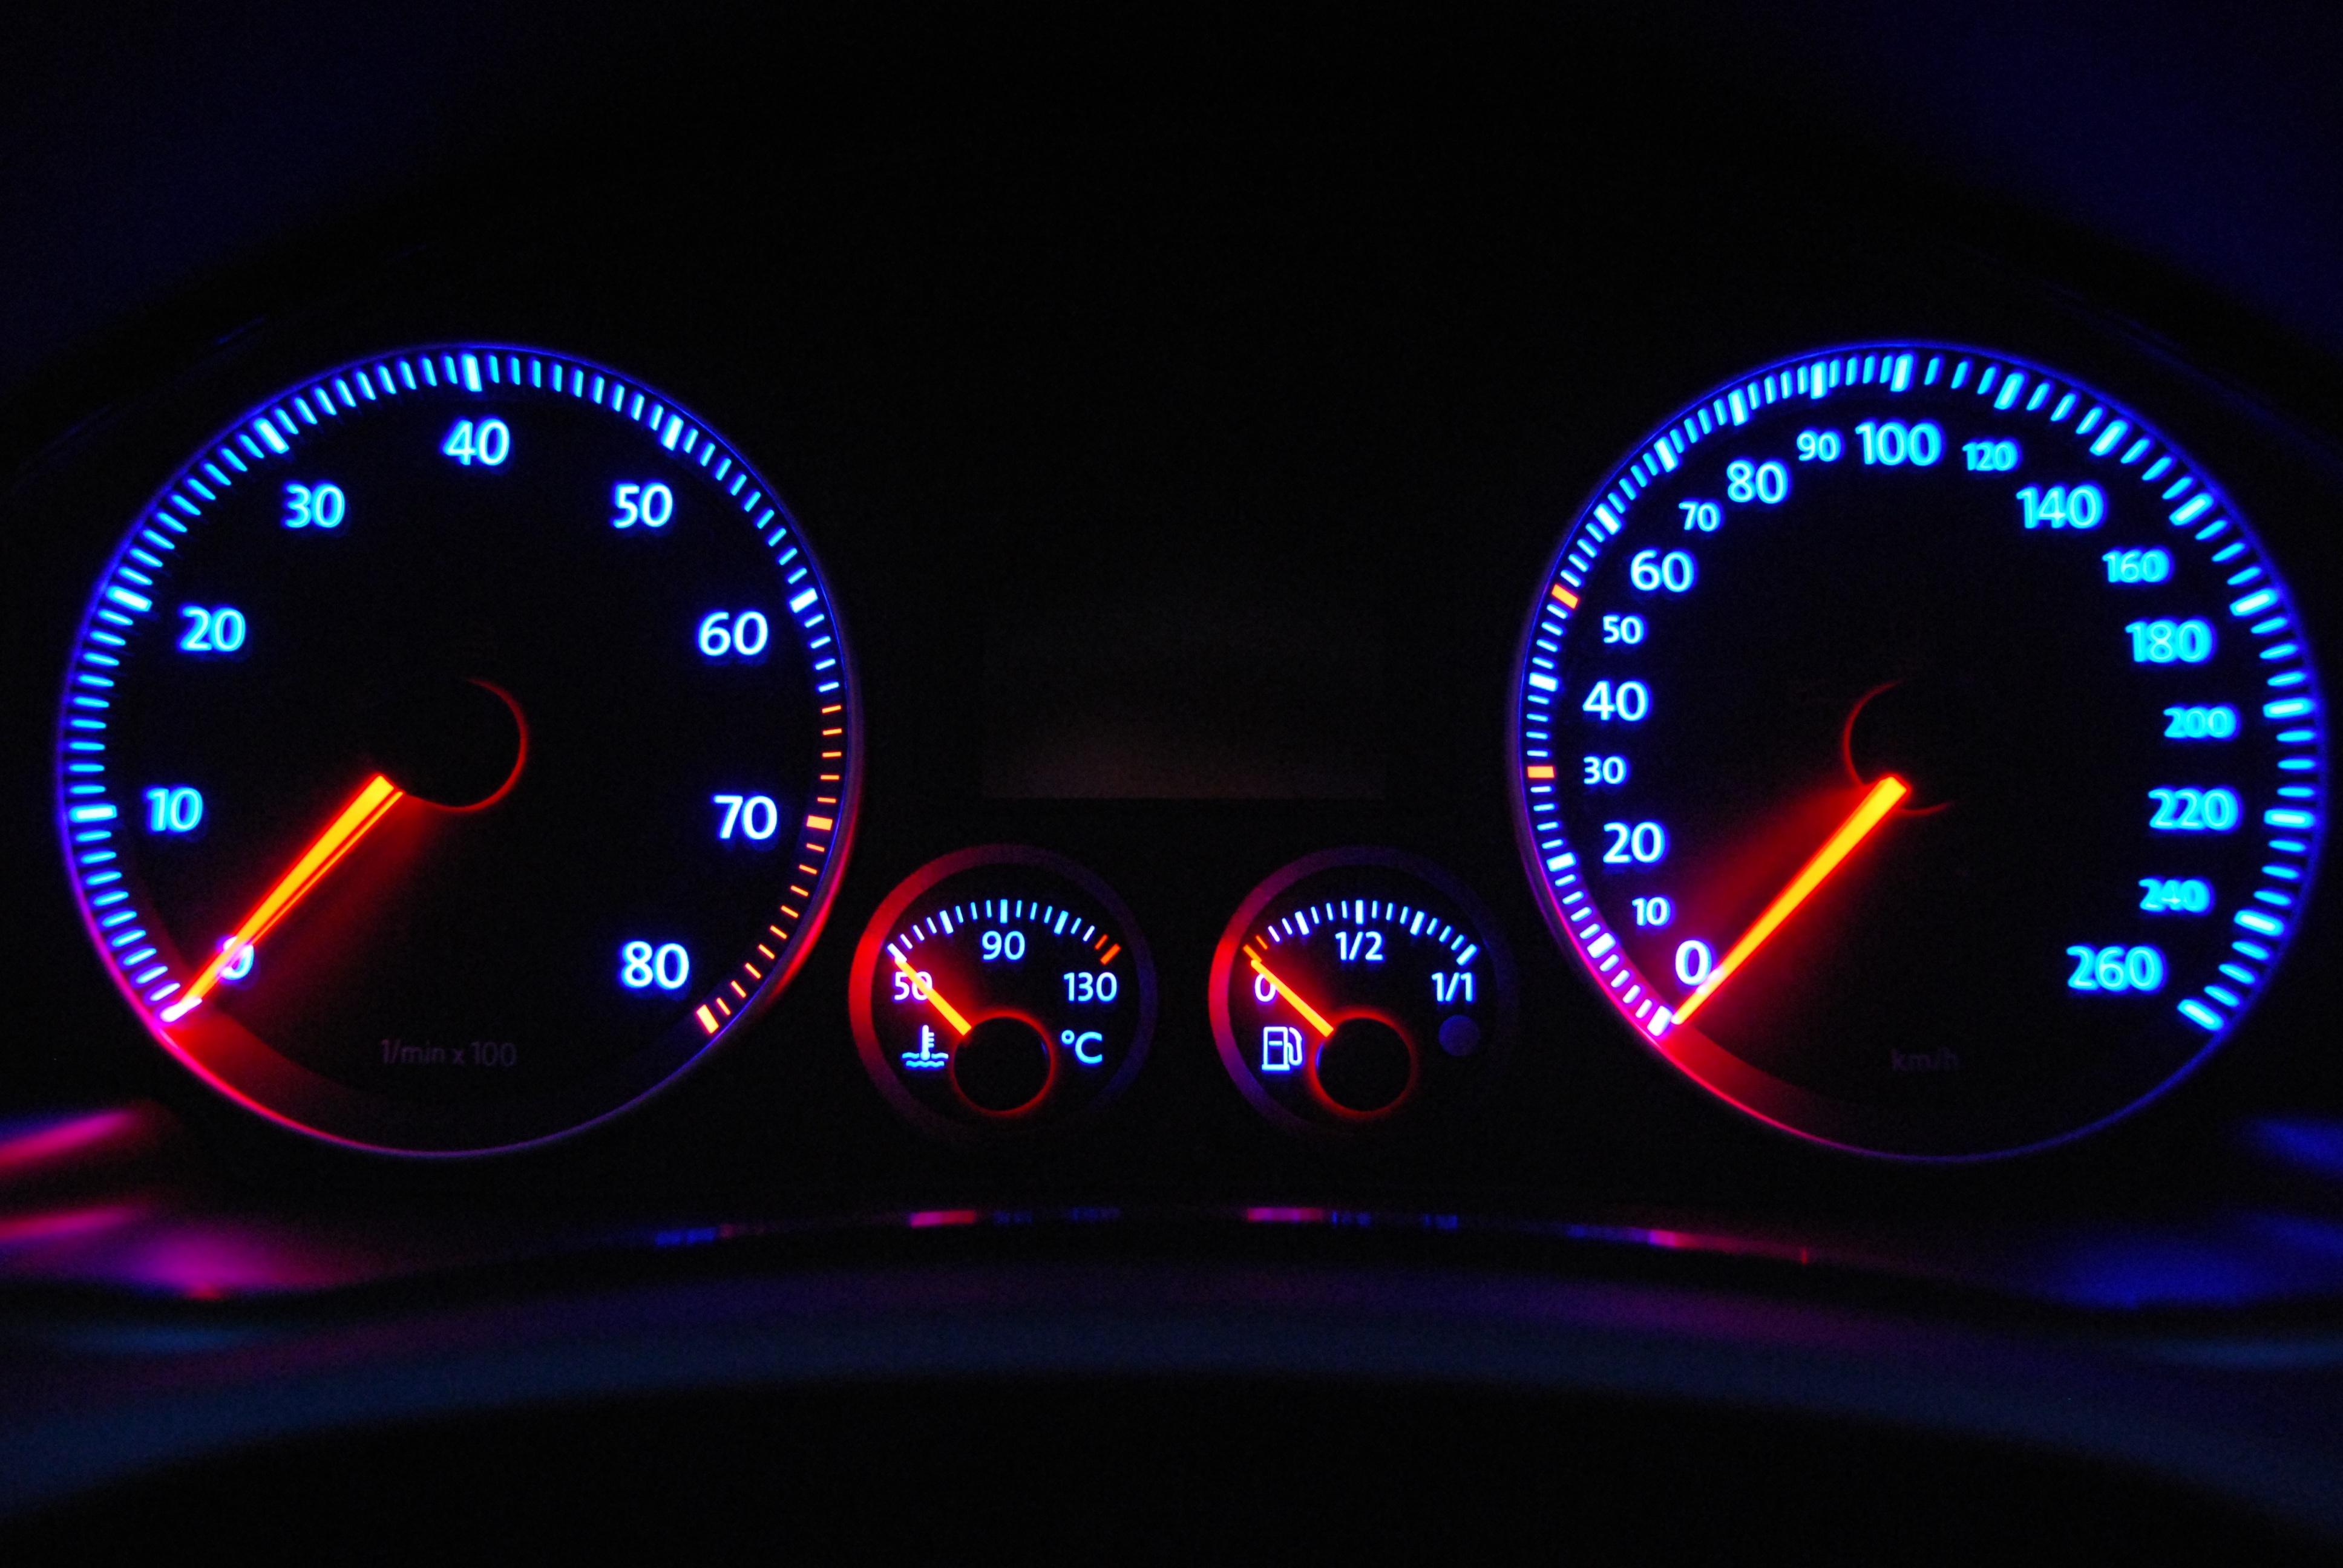 2 Car Garage >> Free Images : vehicle, auto, gauge, steering wheel, dashboard, speedometer, tachometer, rim ...